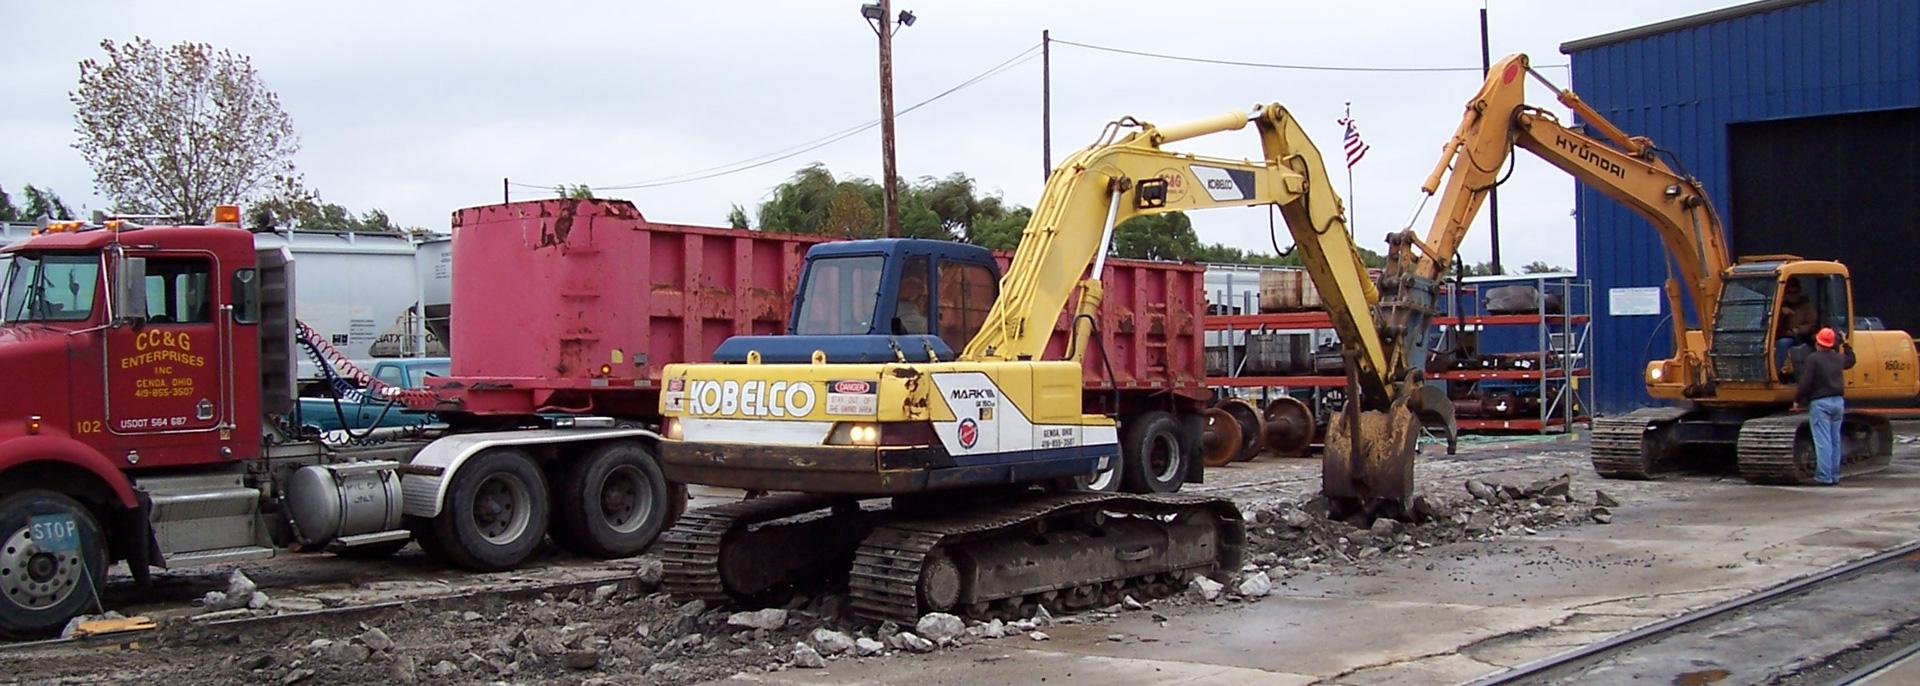 equipment-handling1